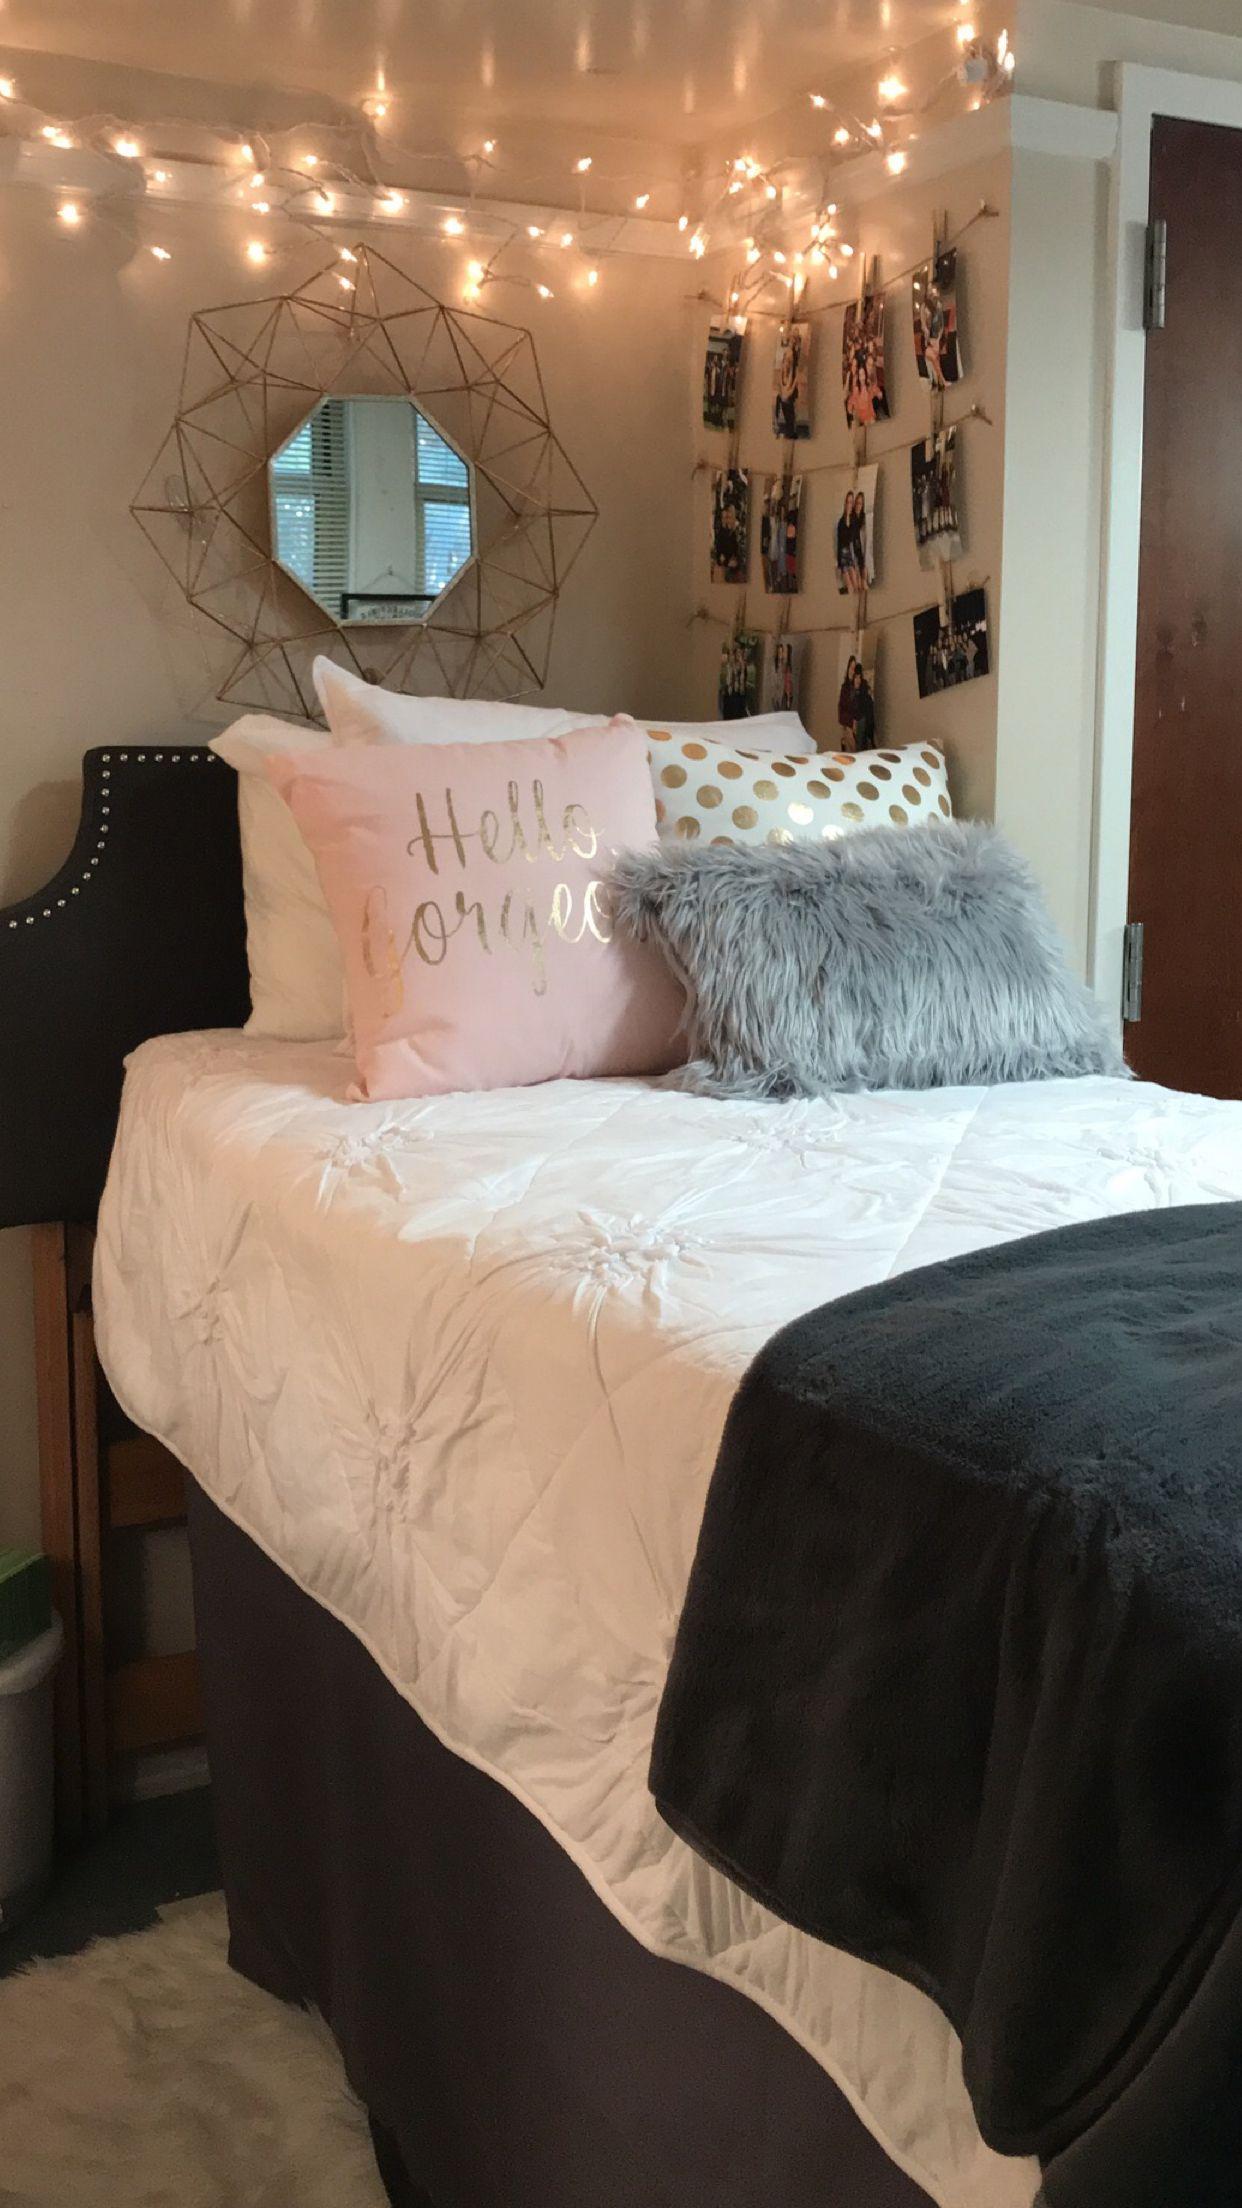 My Fsu Dorm Dorm Sweet Dorm Fsu Dorm Dream Dorm Room